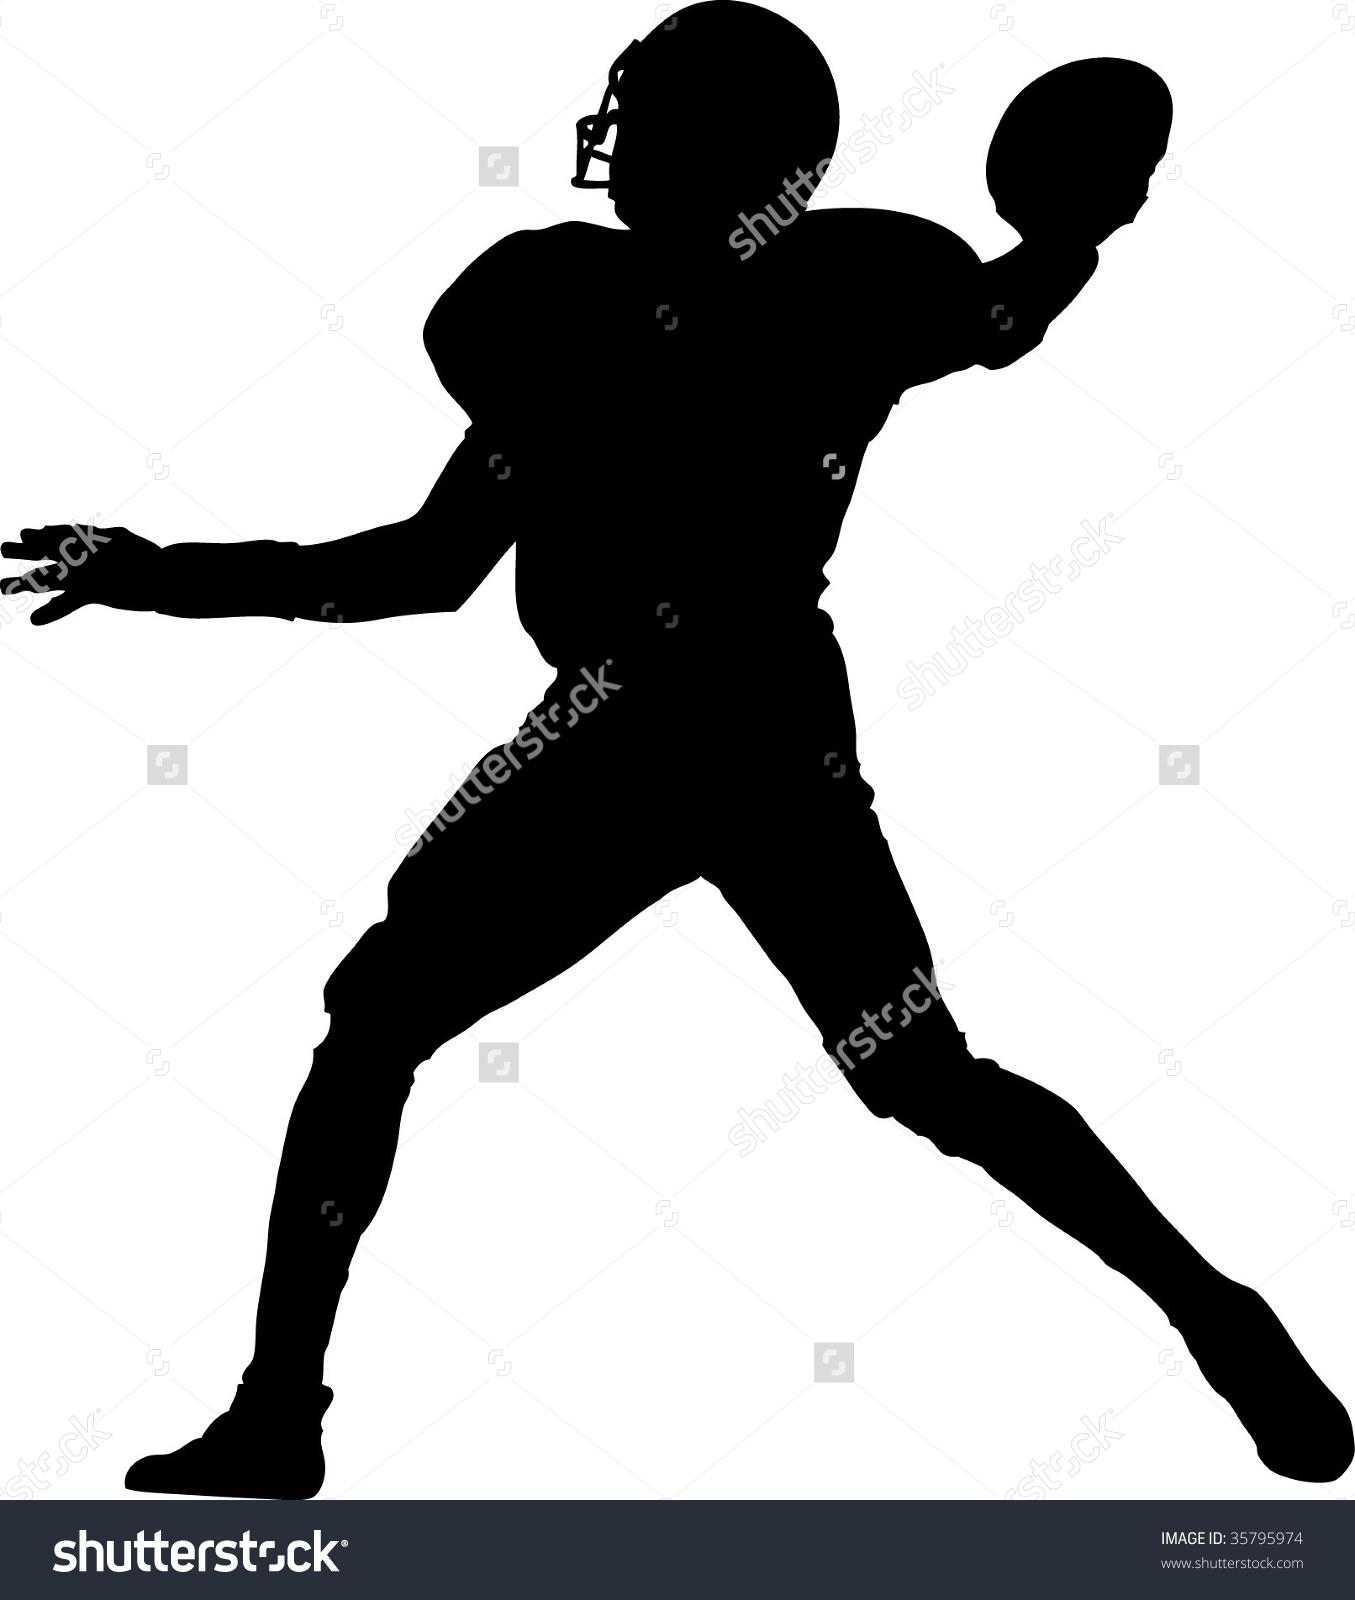 American Football Player Throwing Ball Stock Vector 35795974.